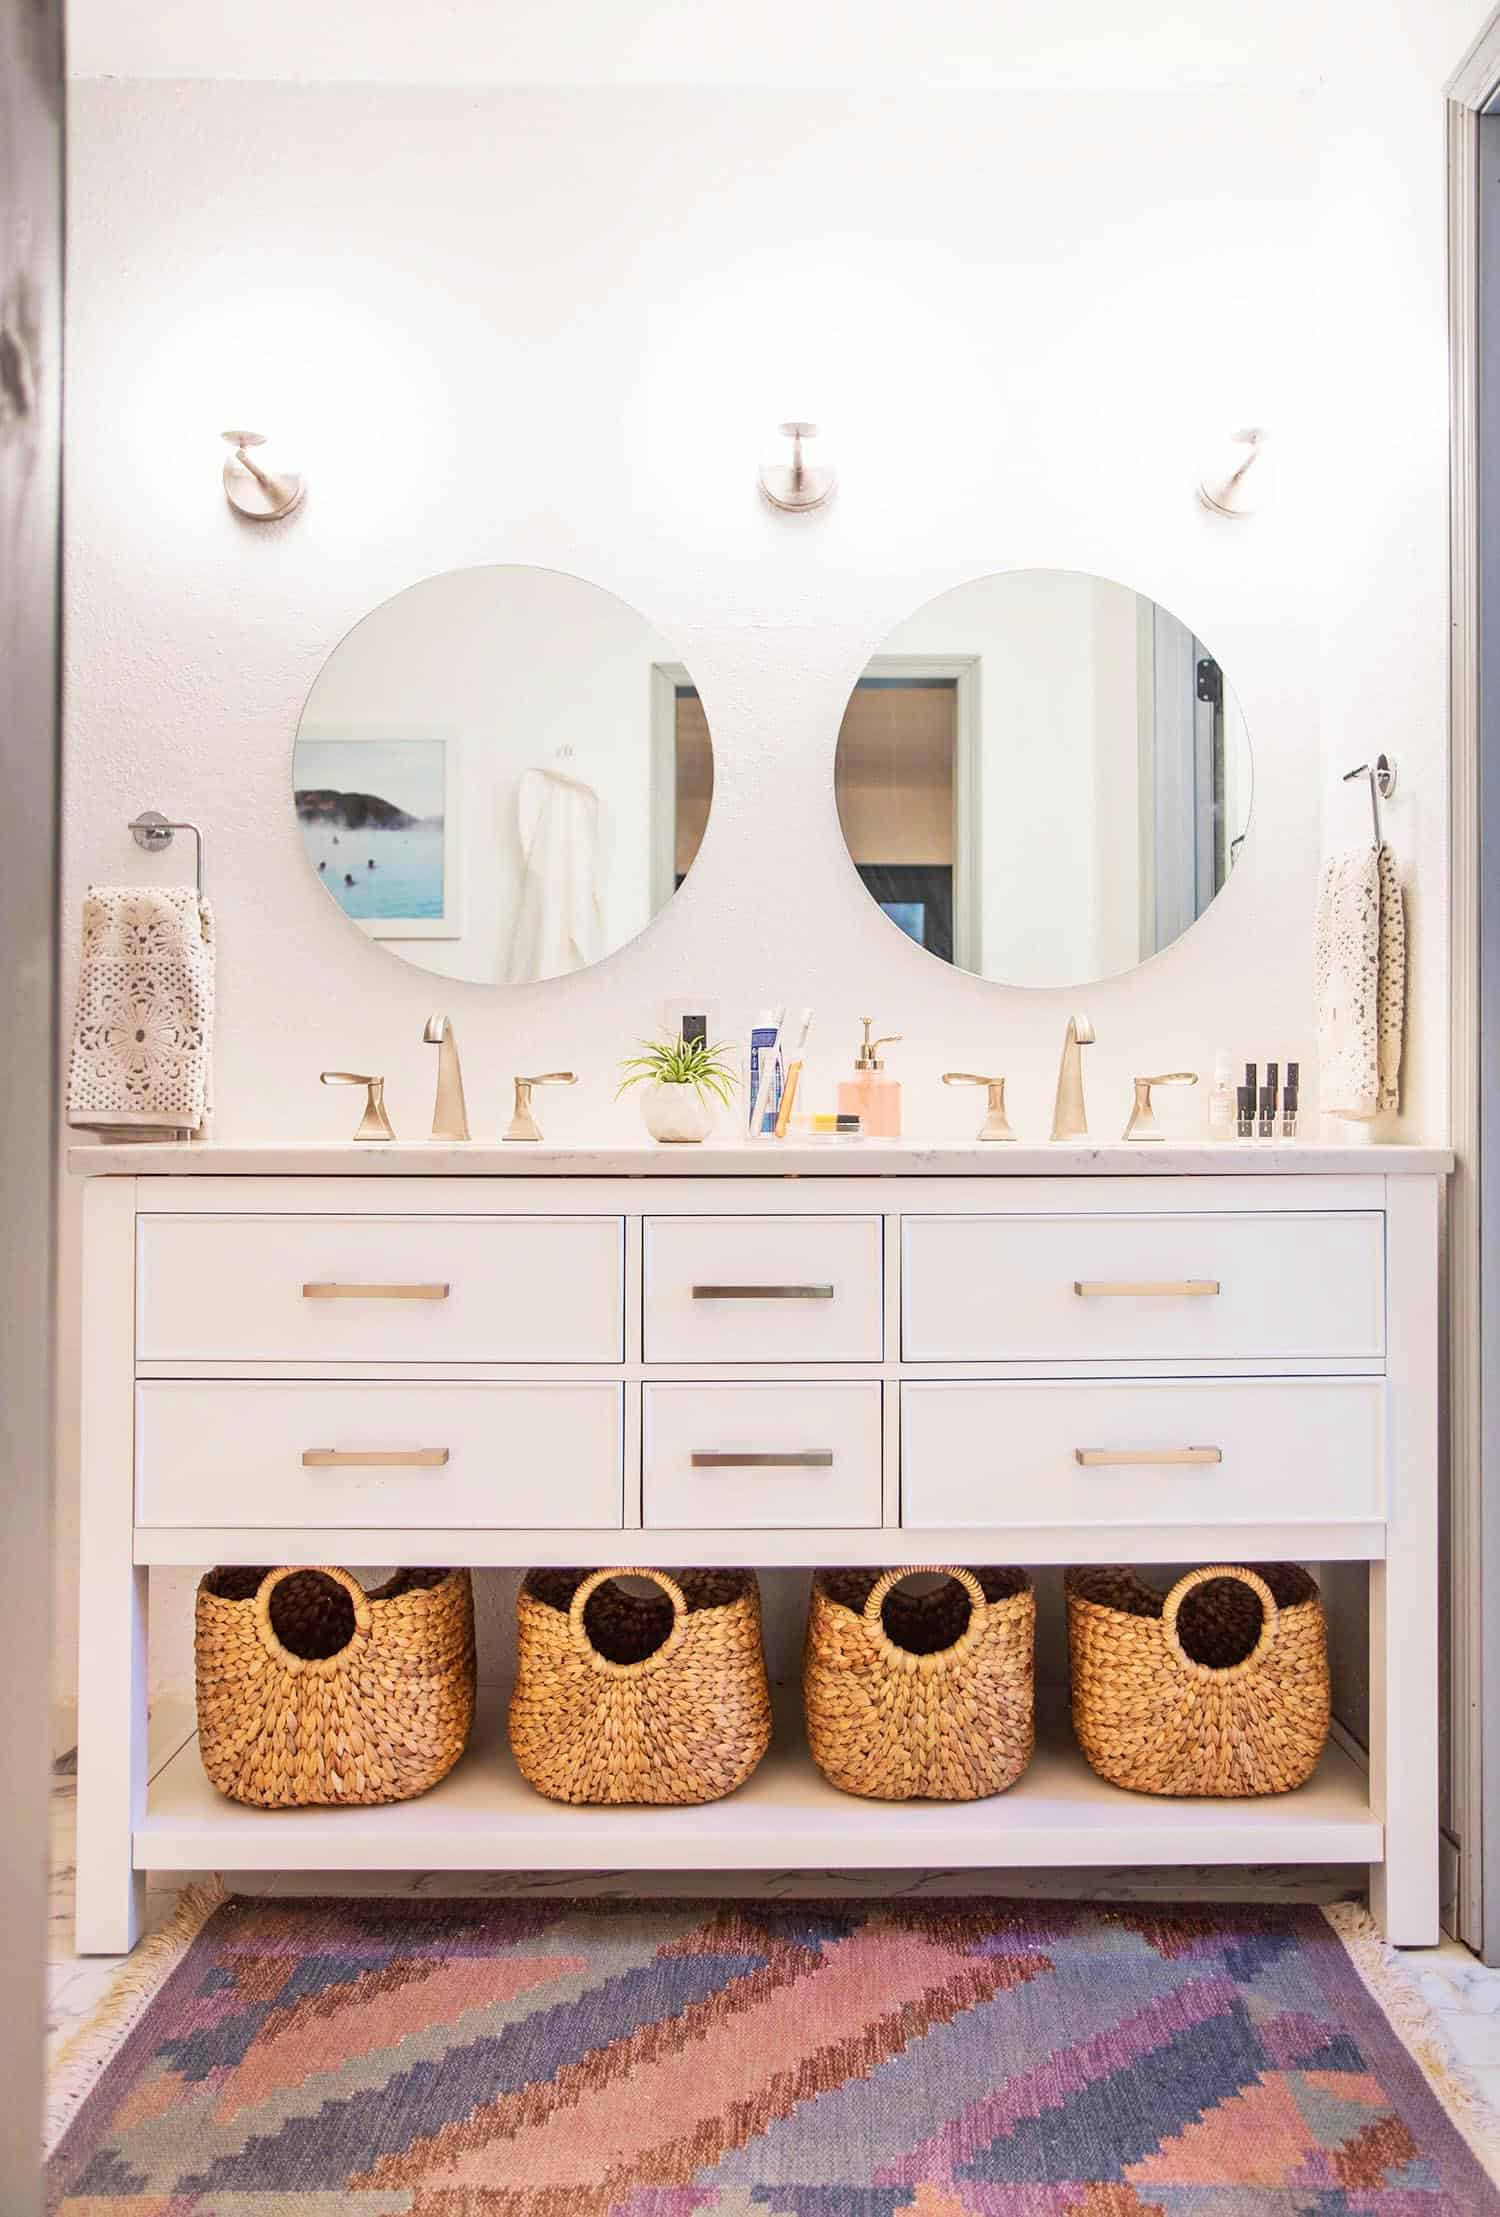 Emmas Master Bathroom Renovation